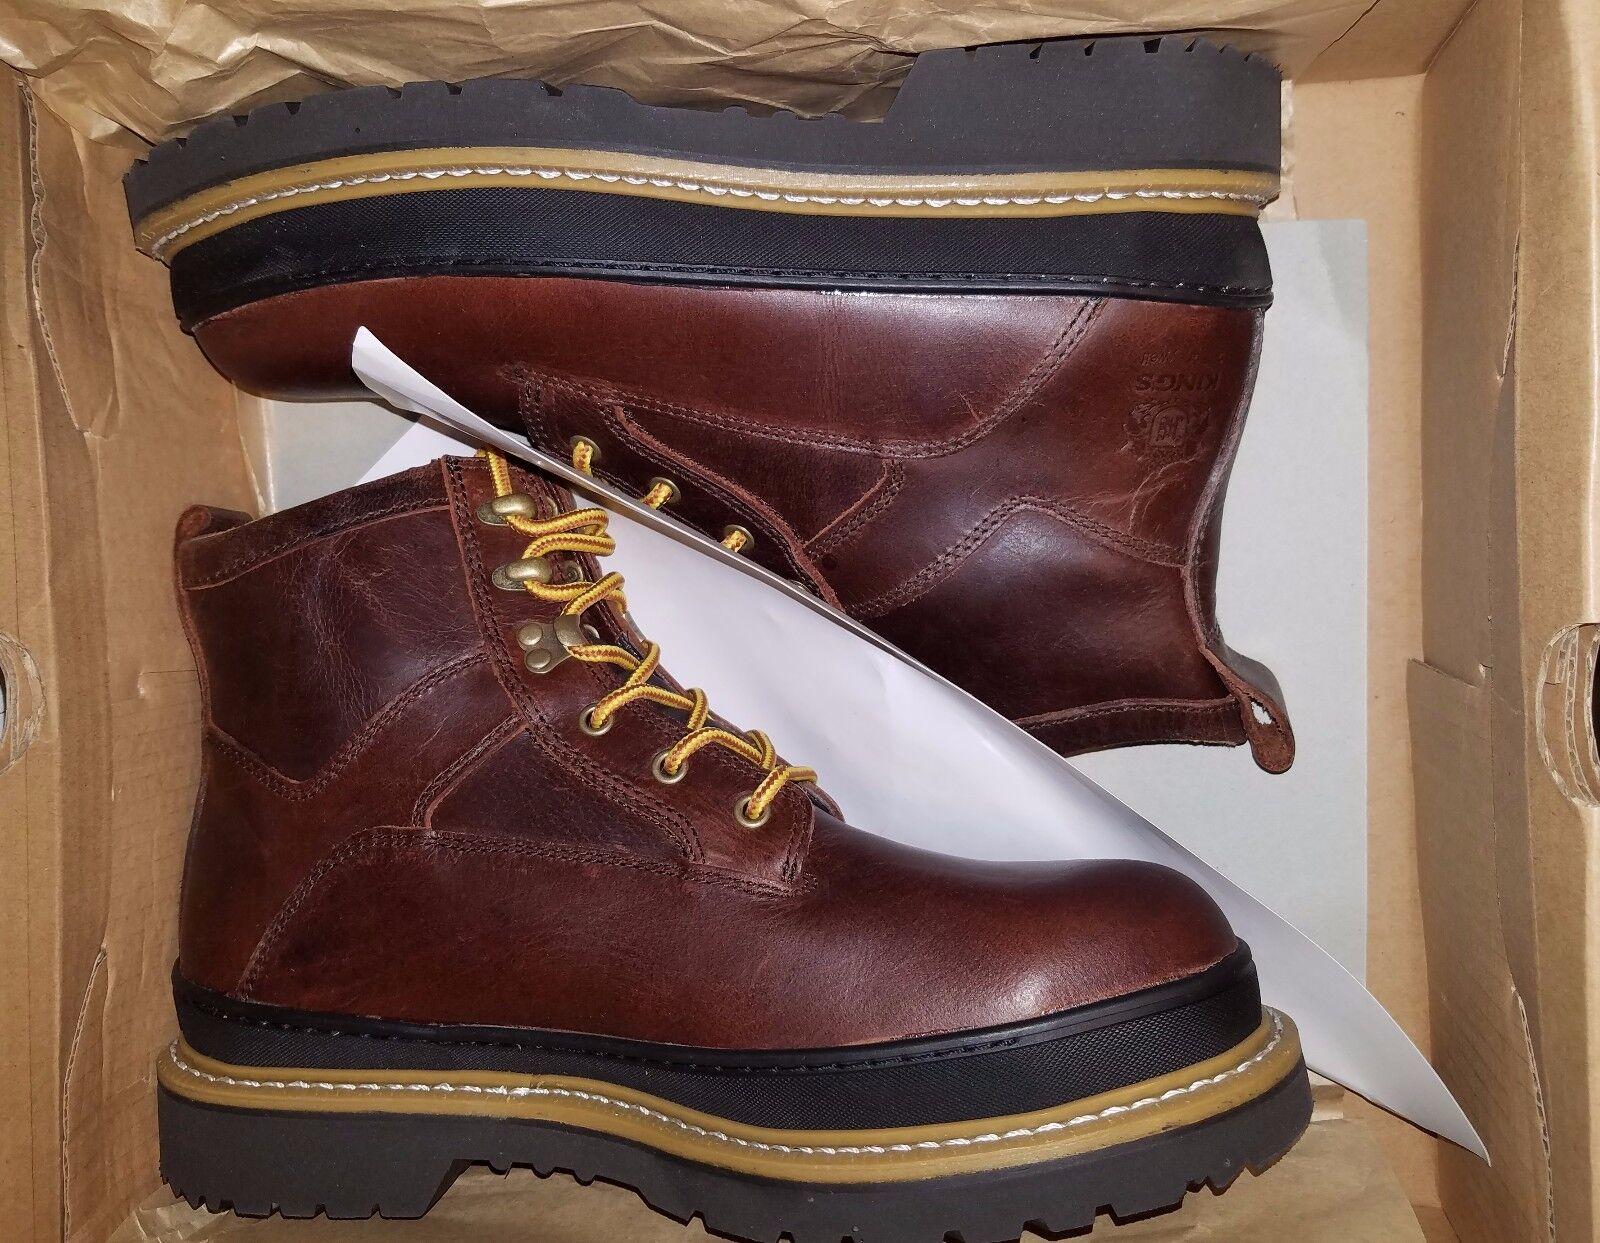 King's Honeywell KGEO02 Steel Toe Goodyear Welted Leather Work Stiefel 6  Größe 11.5